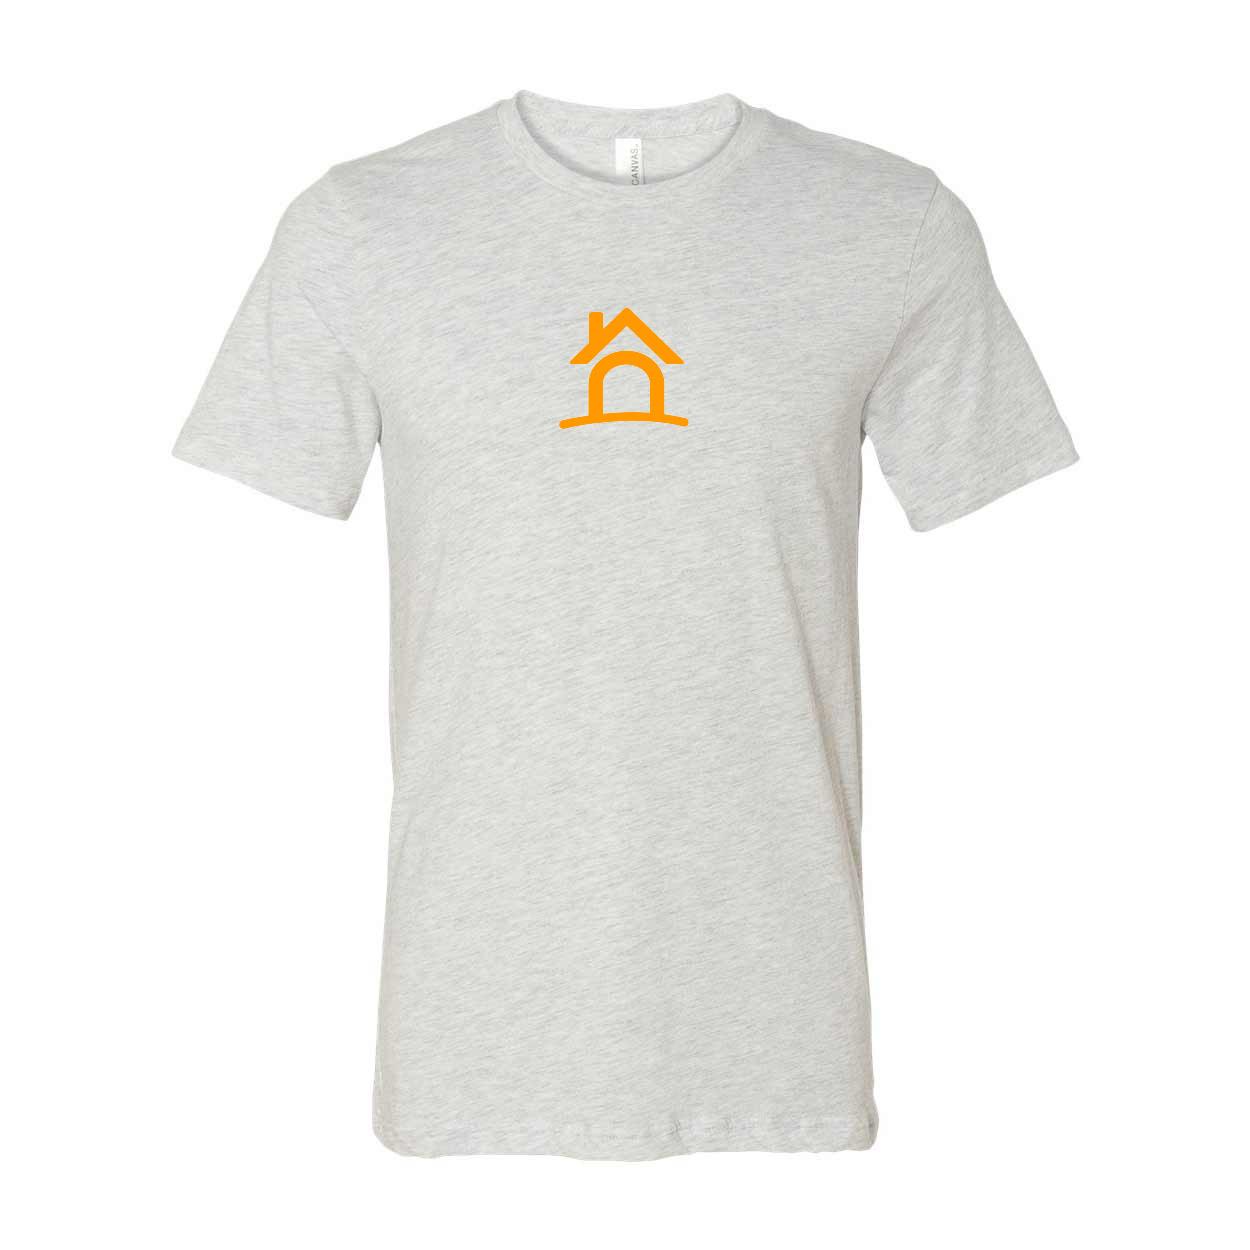 Soft jersey tshirt hs